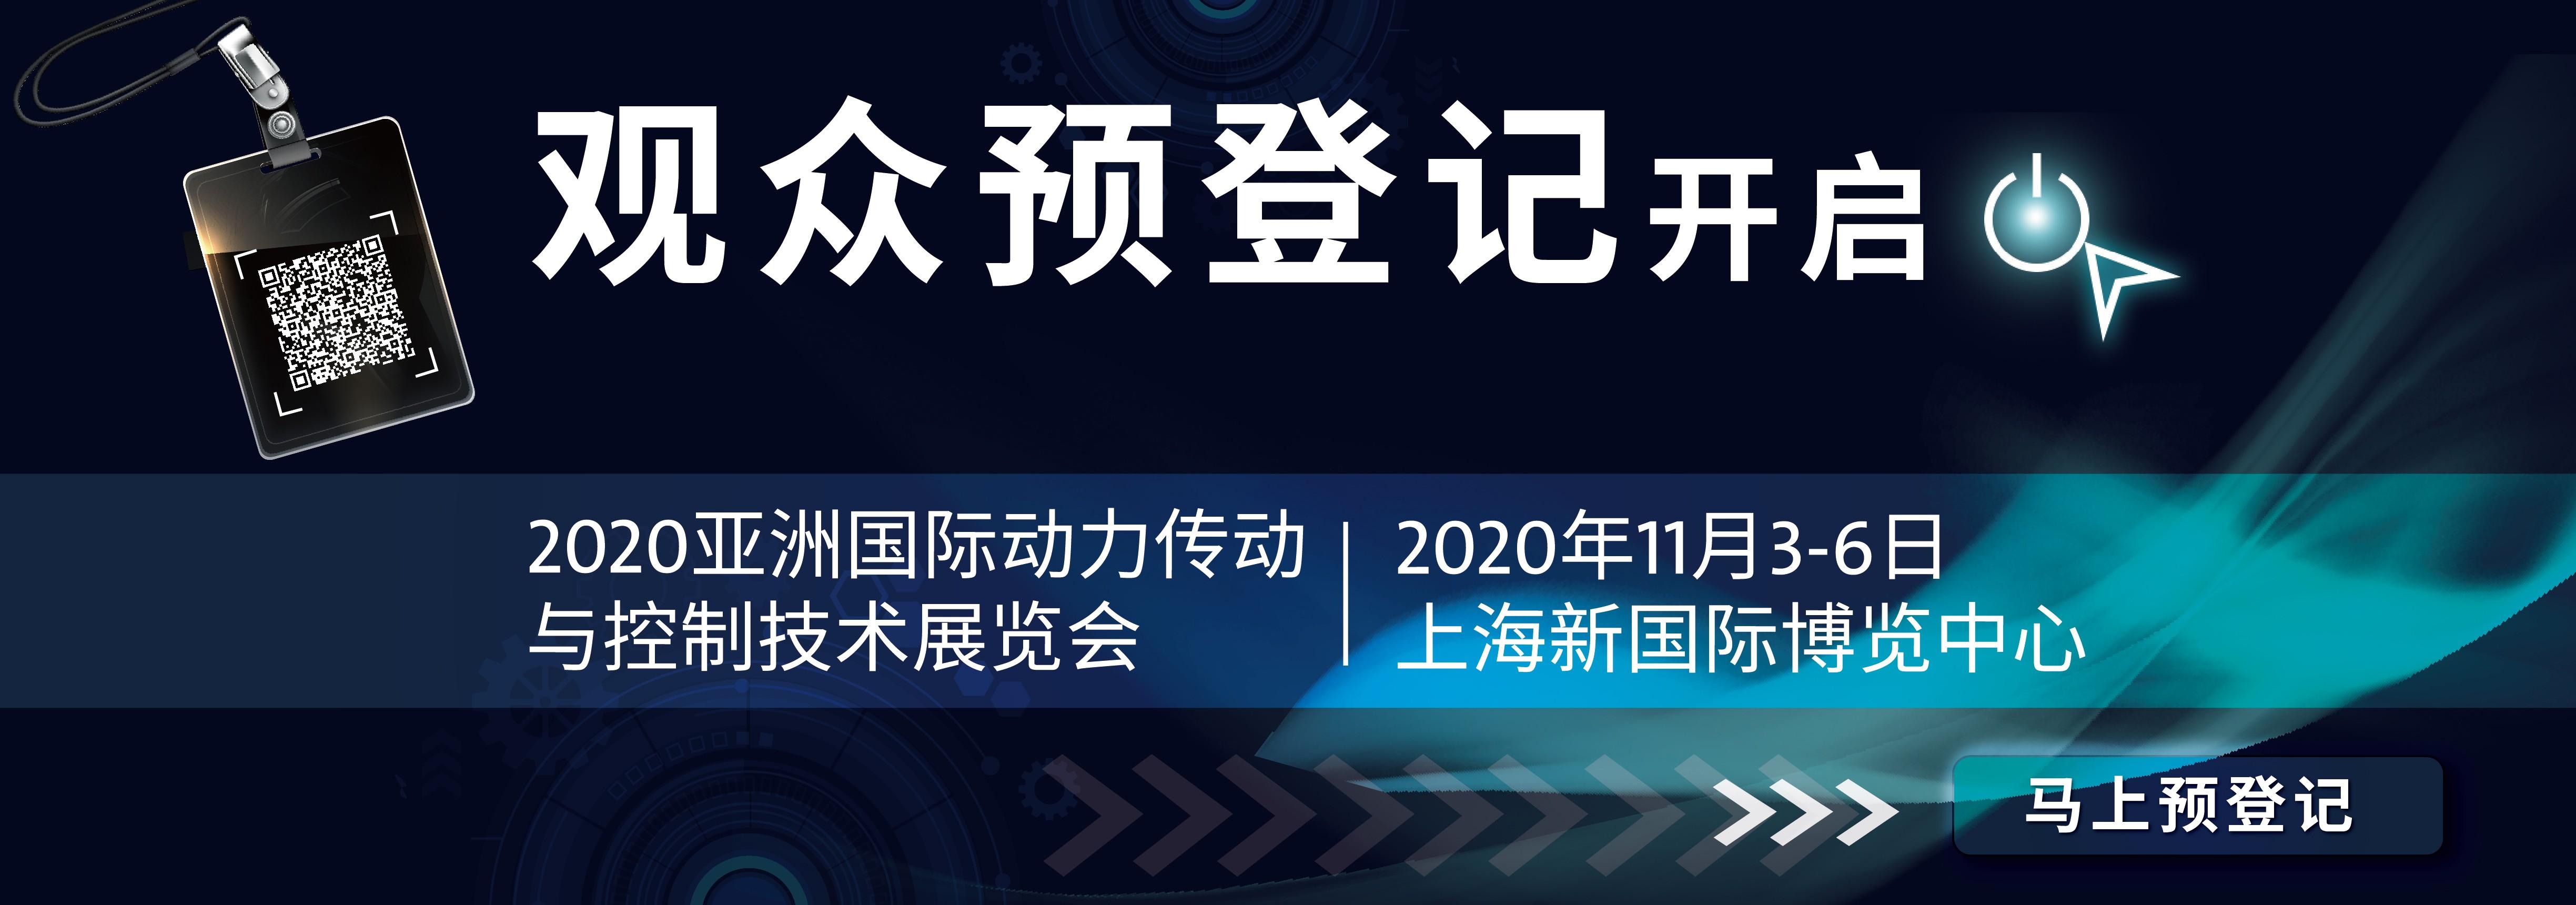 20ptc-观众预登记开启banner2350-825-cn.en_画板 1 副本 4.jpg